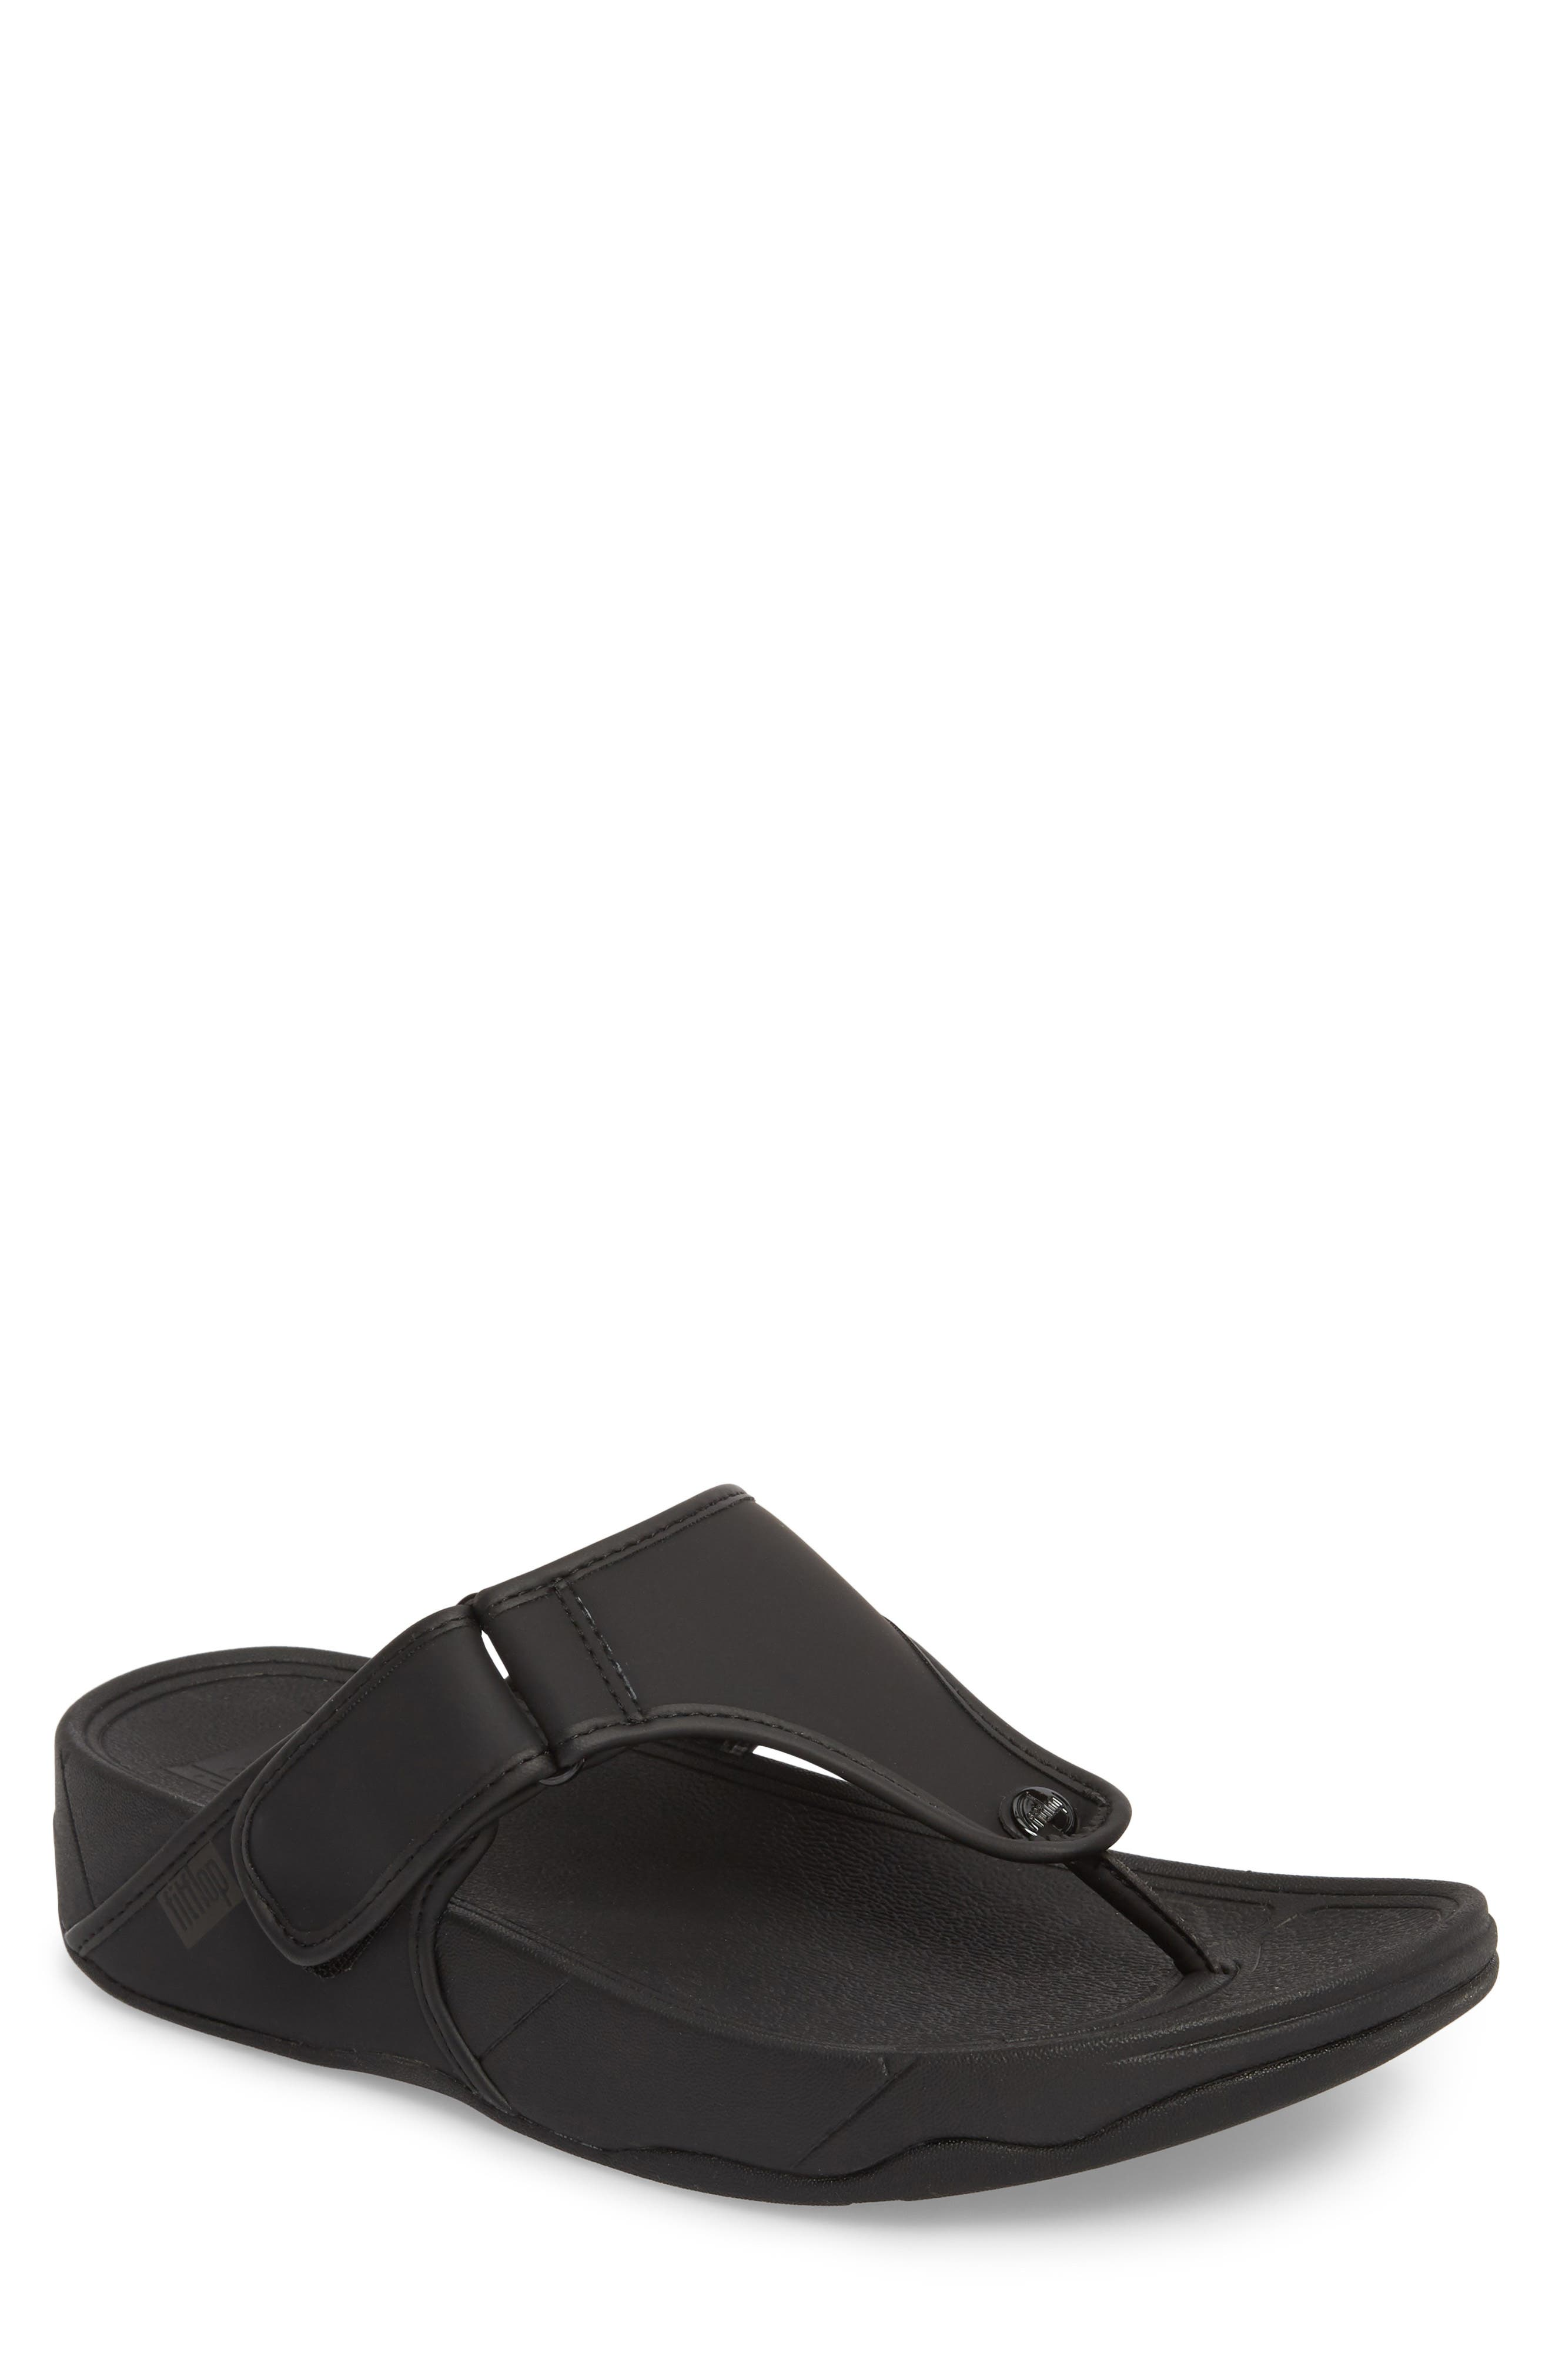 FITFLOP,                             Trakk<sup>™</sup> II Sandal,                             Main thumbnail 1, color,                             BLACK NEOPRENE